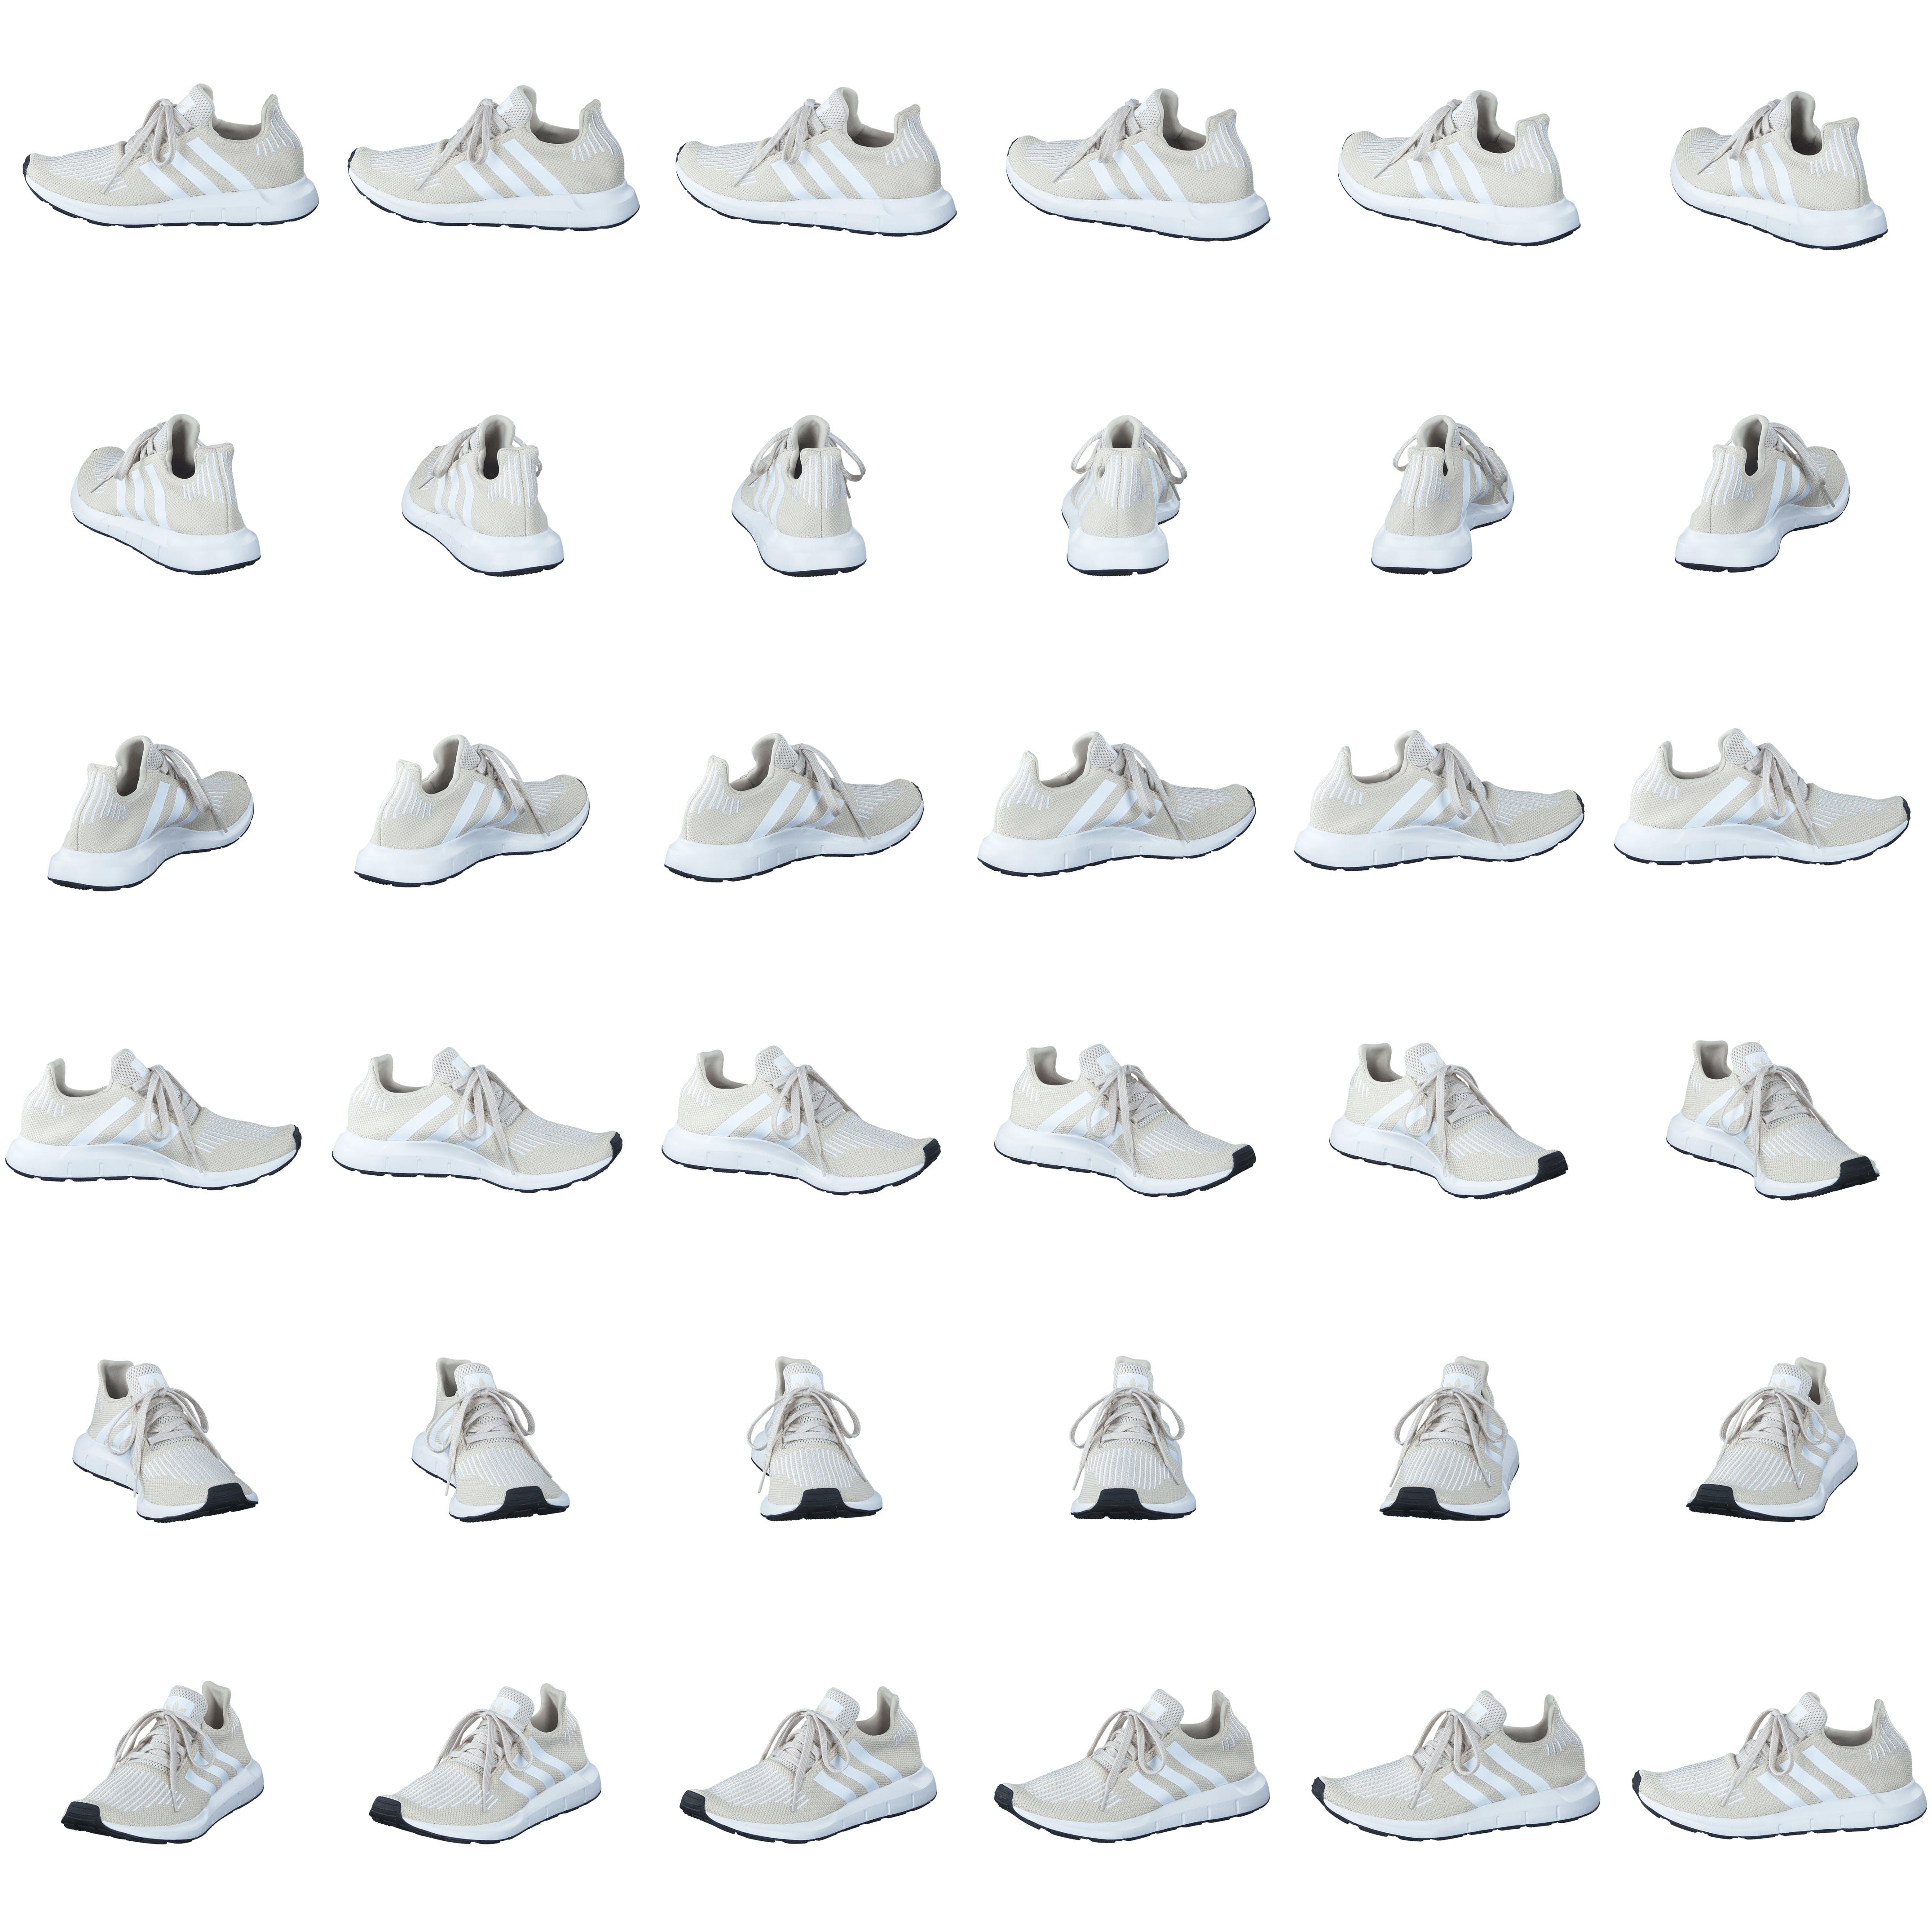 Kjøp adidas Originals Swift Run W Clear BrownFtwr White